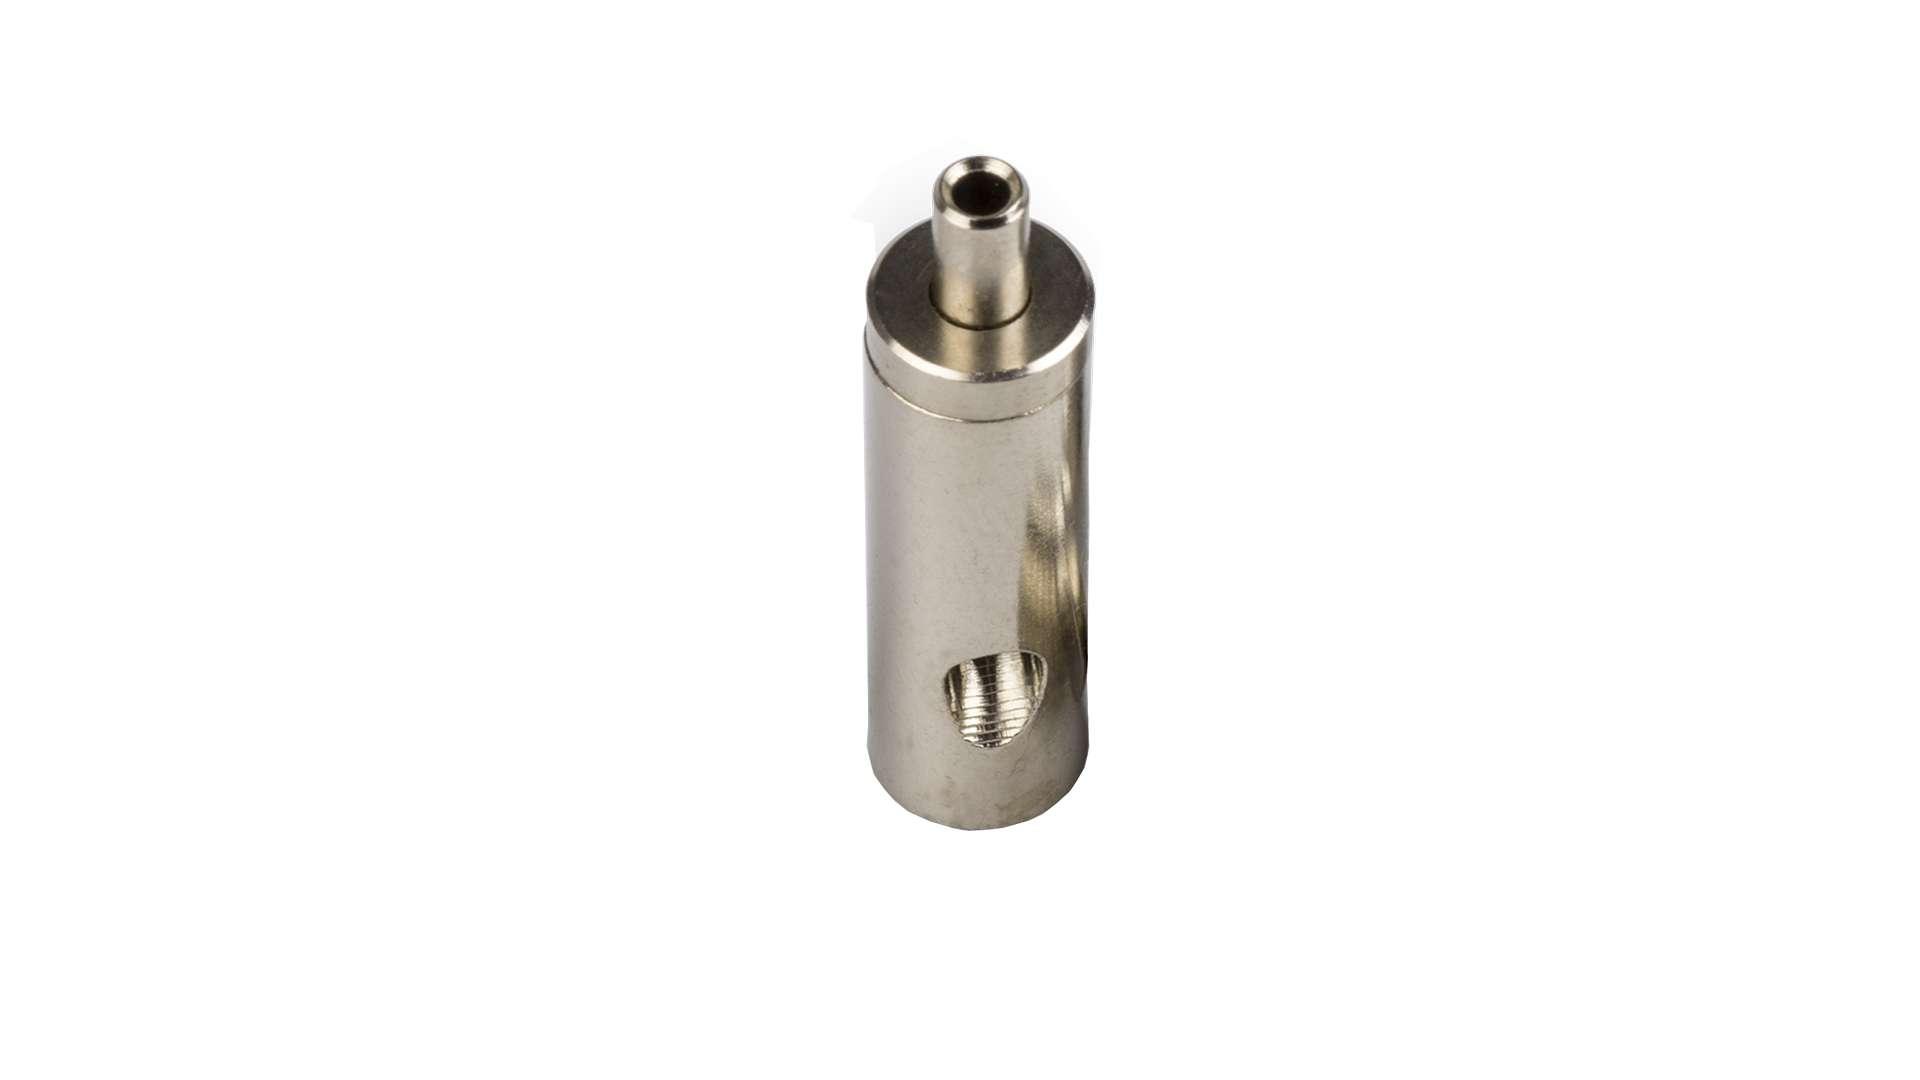 Pendant Lock M4 9x29, nickel